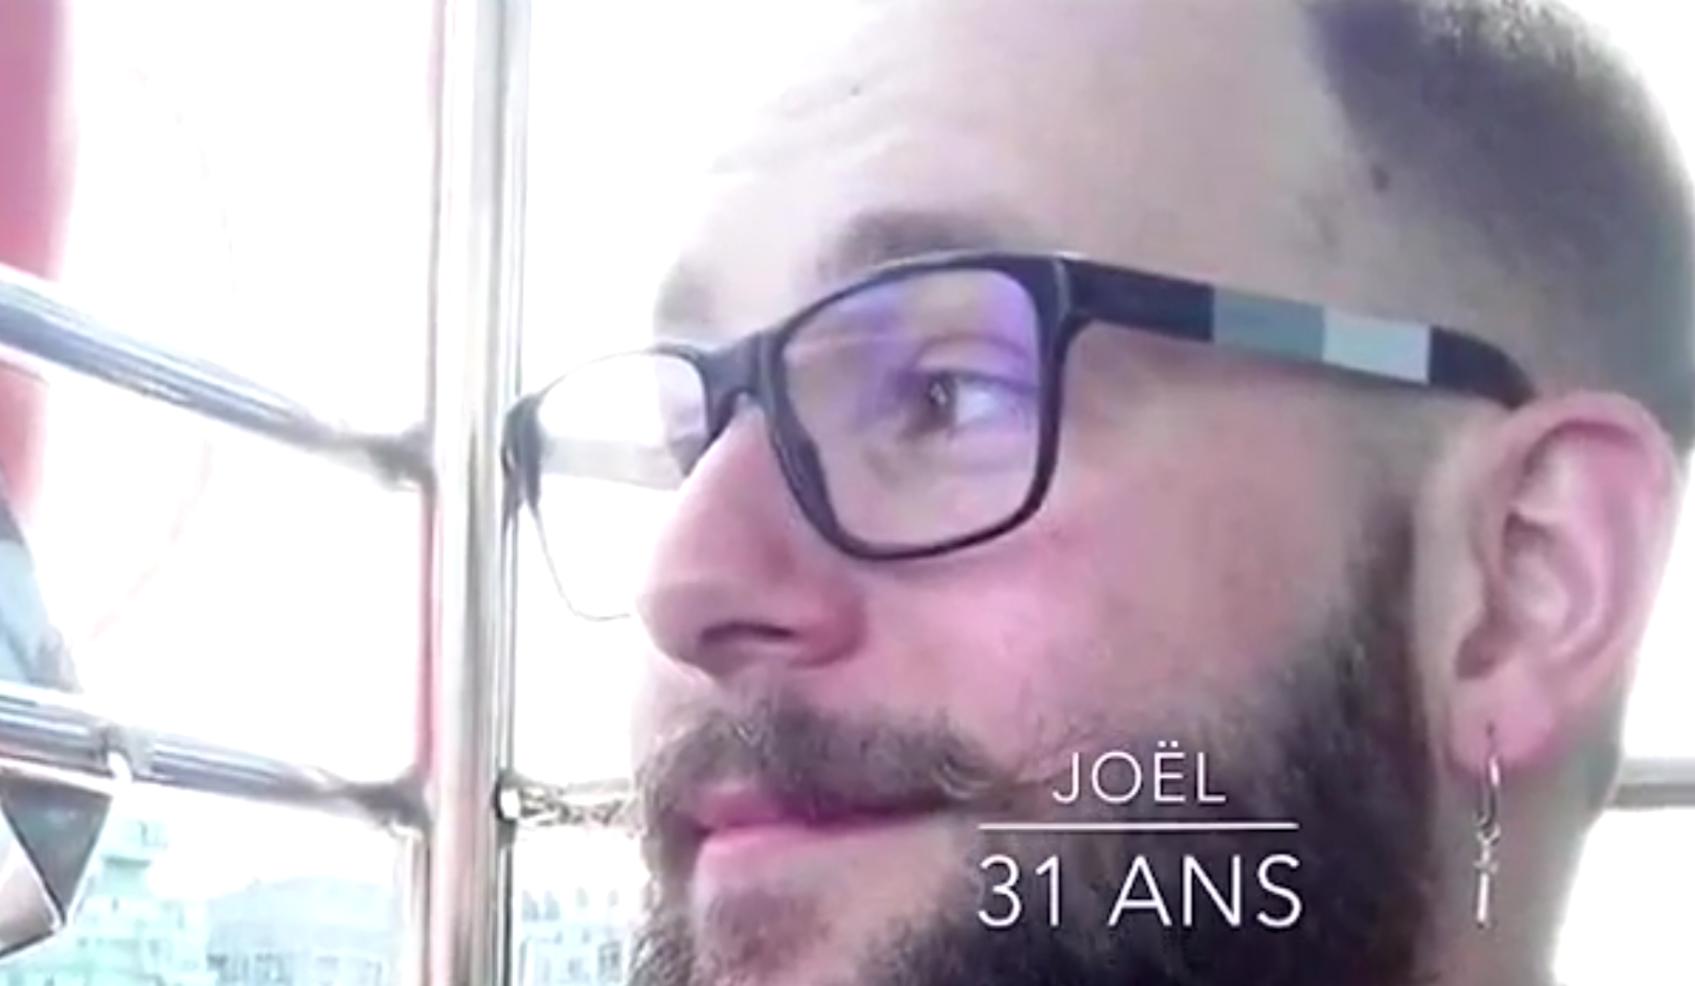 Joël, Candidat à Mister Bear Rhône Alpes Auvergne 2018